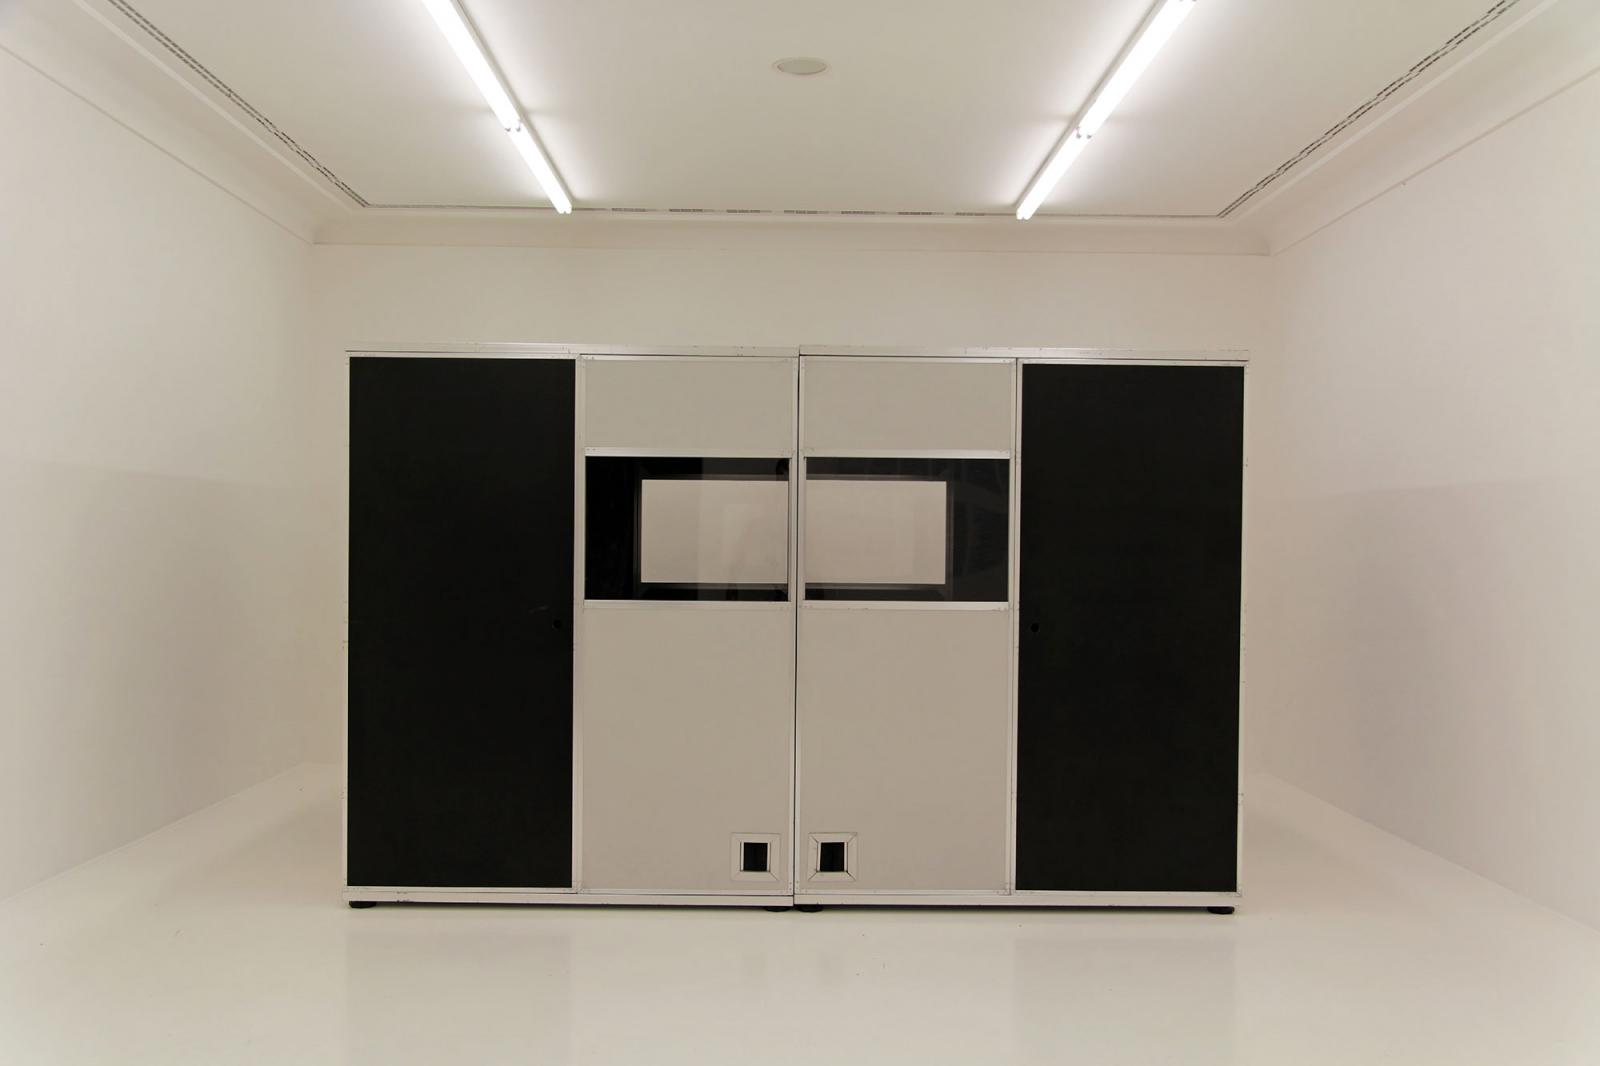 Ceal Floyer Installation view/Romance/ atHelmhaus Photo: Manifesta 11 / Wolfgang Träger